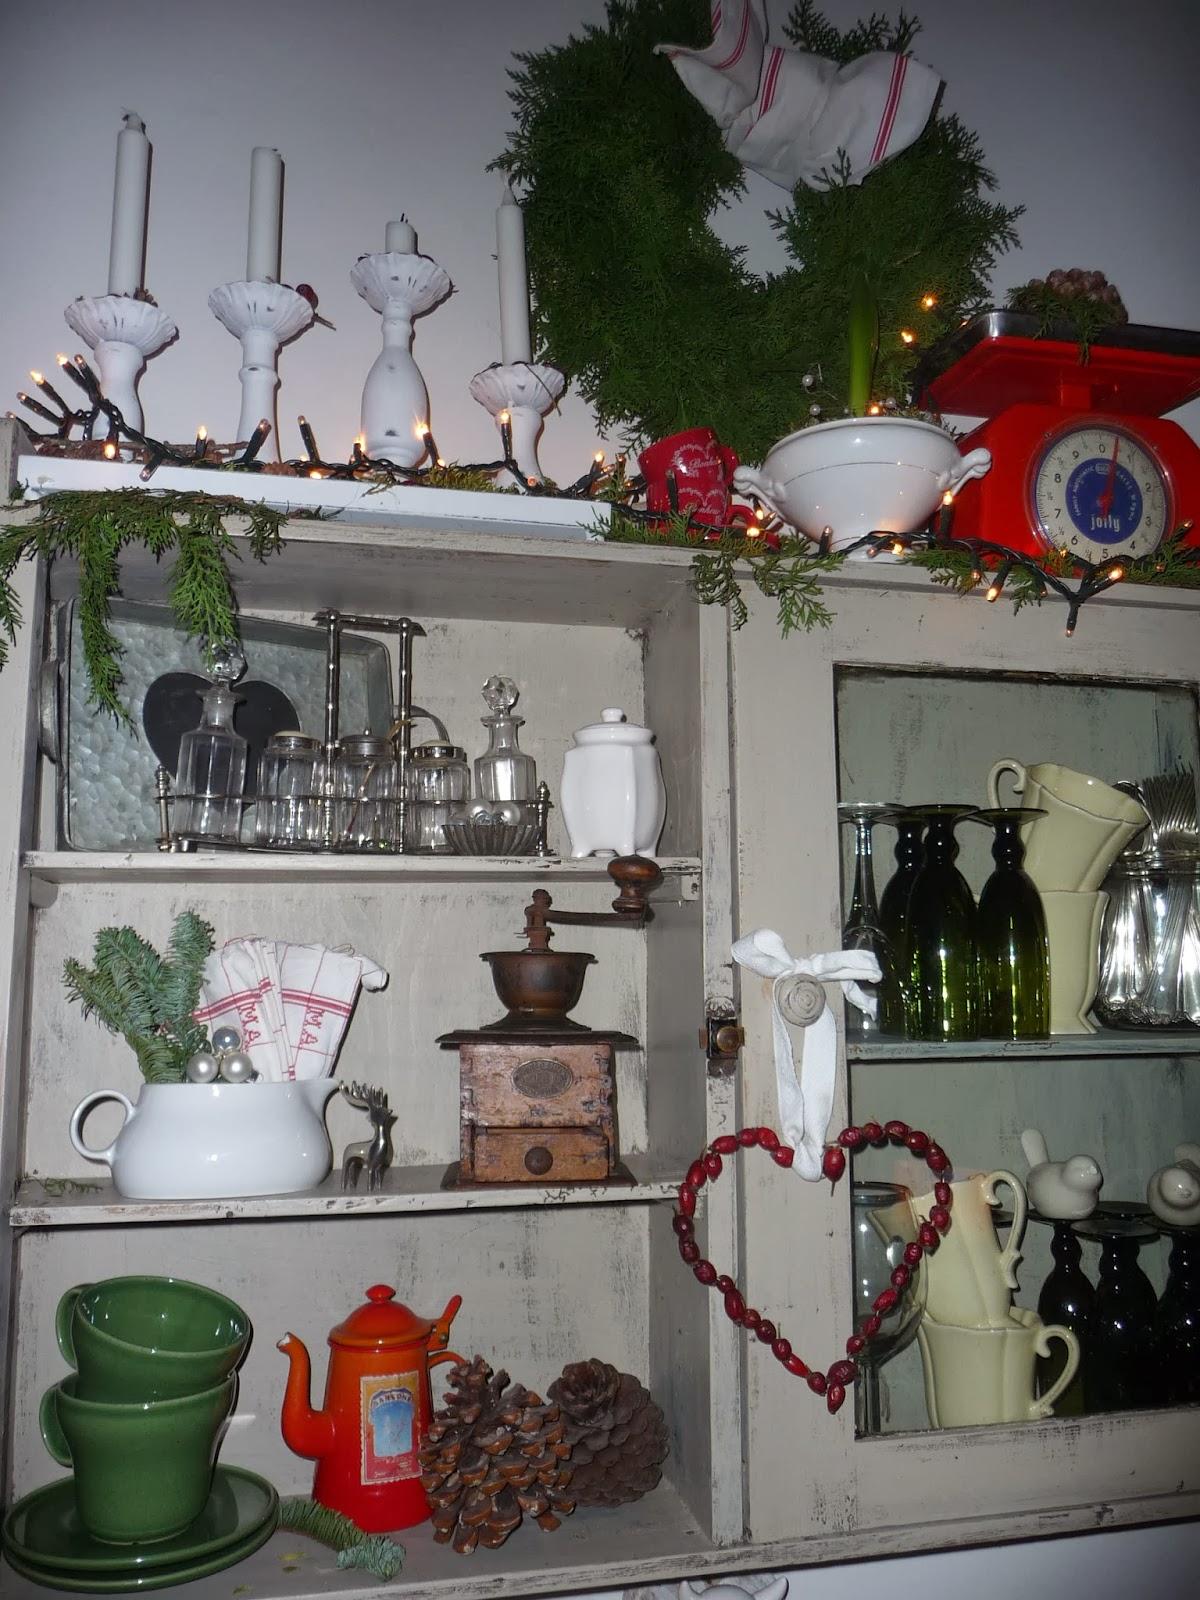 my little corner in rome.....: idee per addobbi natalizi ...